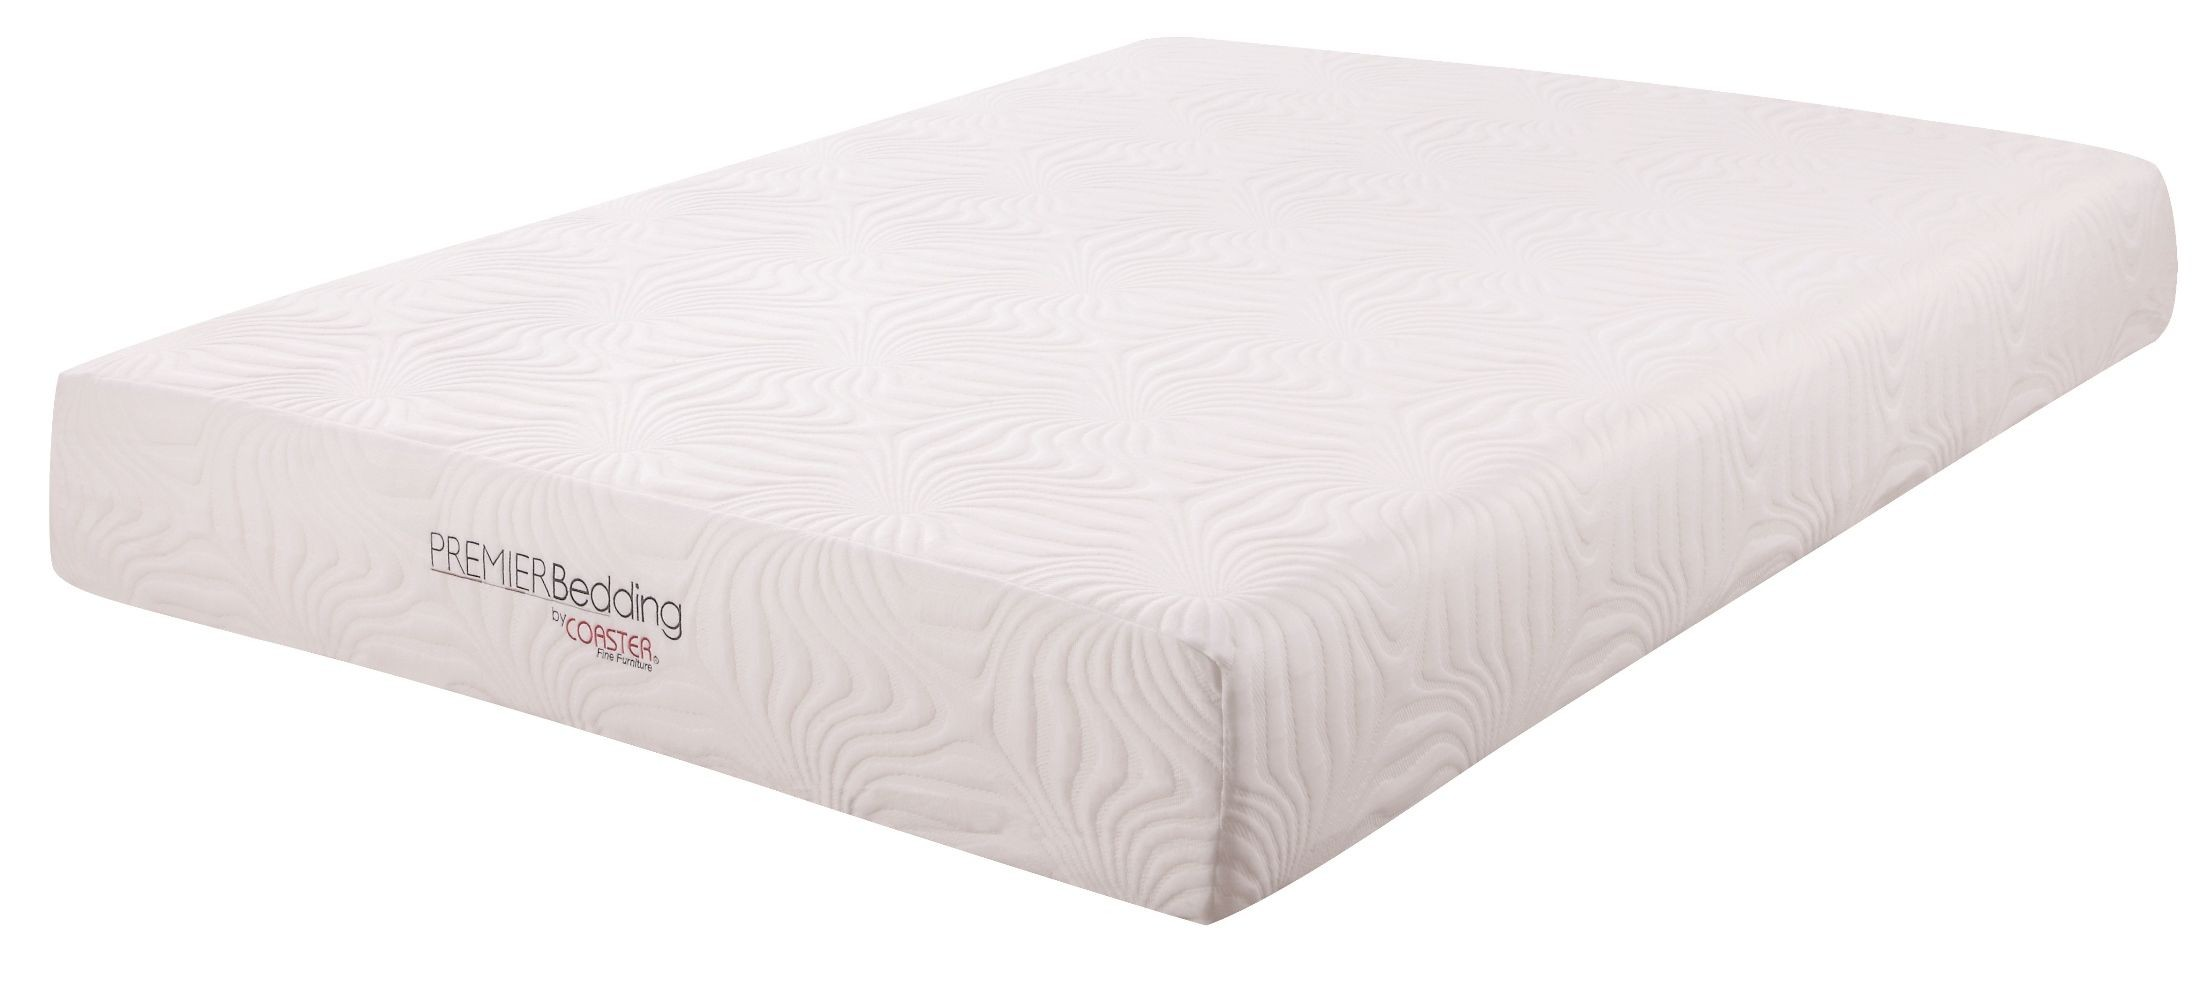 10 twin xl memory foam mattress 350064tl coaster furniture. Black Bedroom Furniture Sets. Home Design Ideas